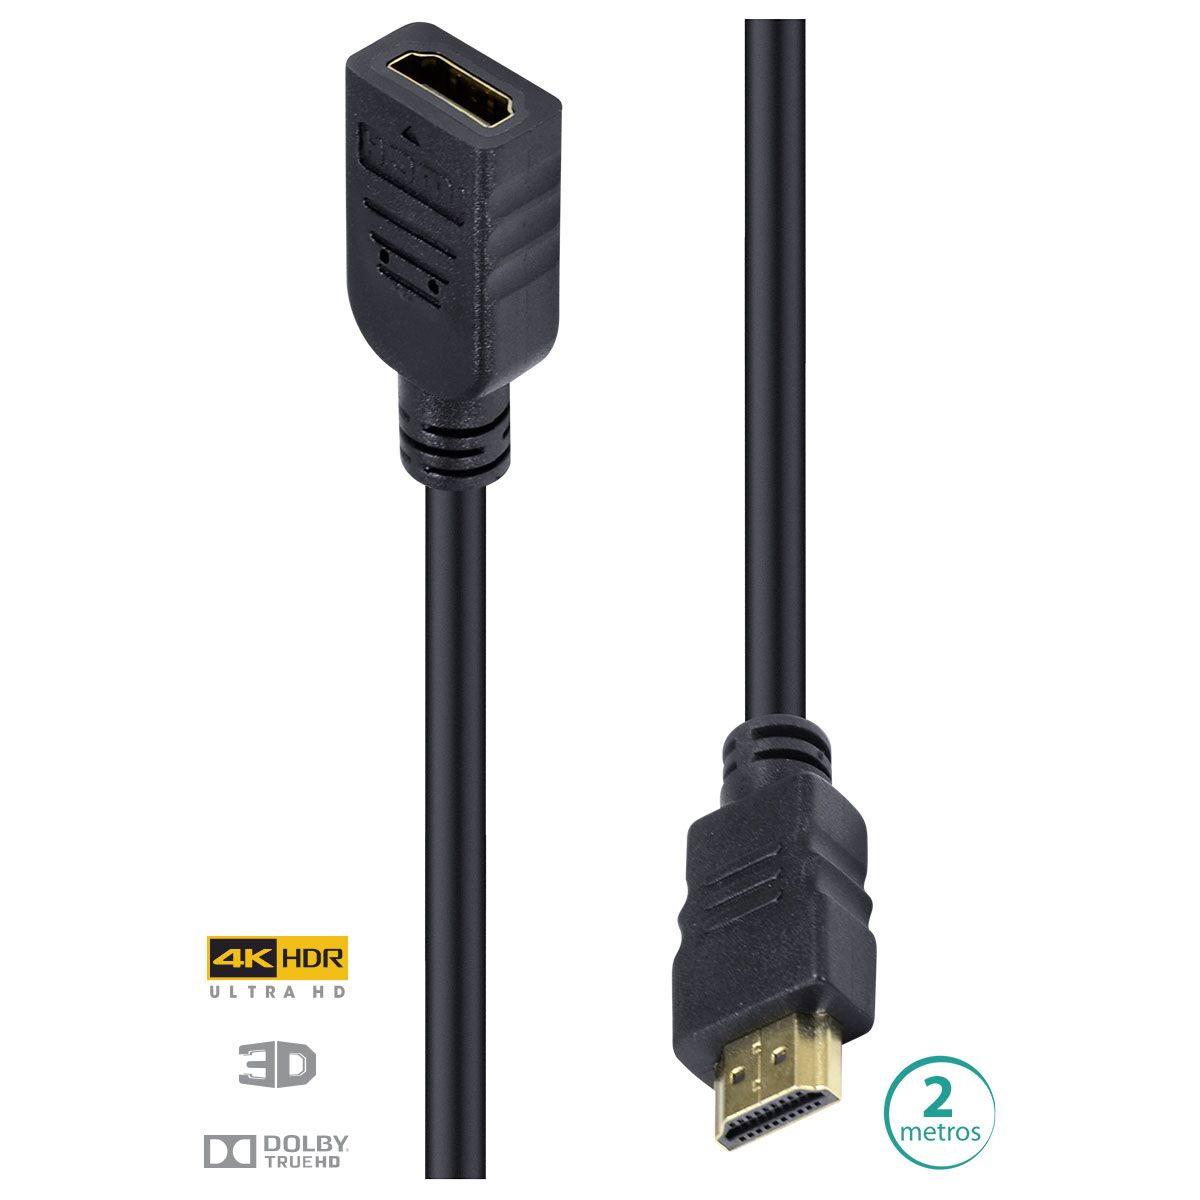 CABO HDMI 2.0 4K EXTENSOR ULTRA HD 3D CONEXÃO ETHERNET 2 METROS ? H20EX-2